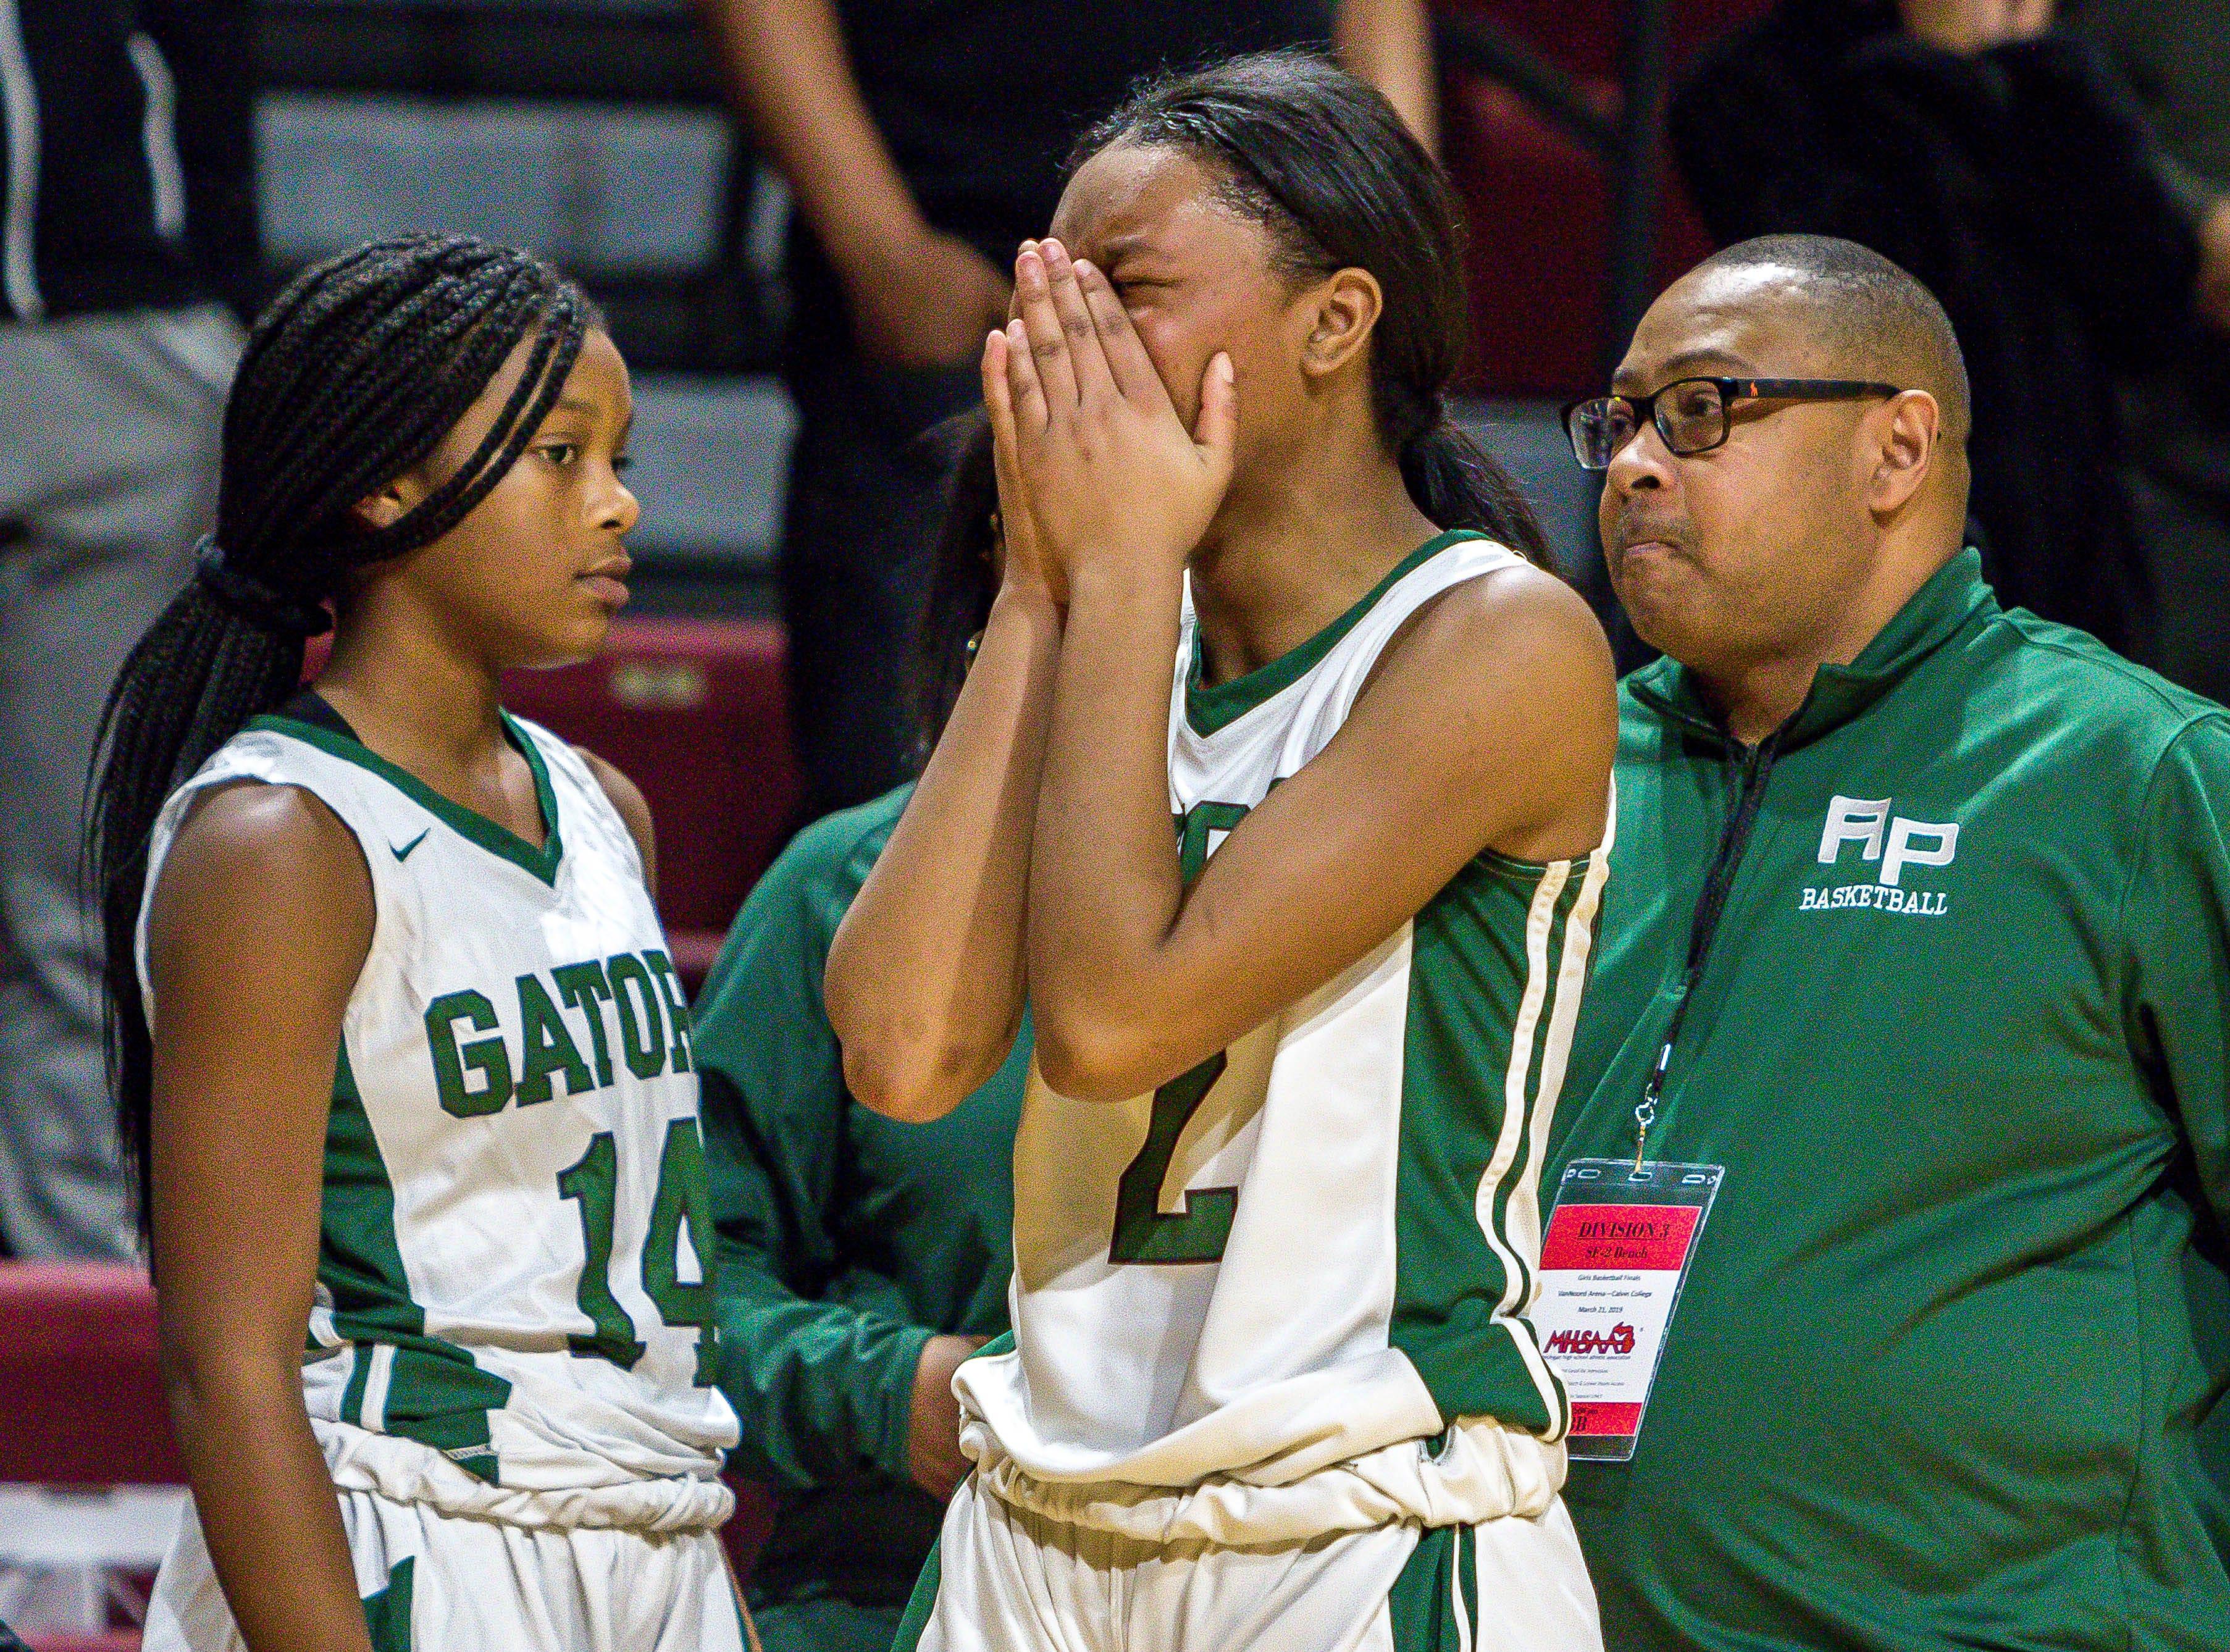 Ypsilanti Arbor Prep's Jazmin Chupp (2) reacts after a heartbreaking overtime loss.